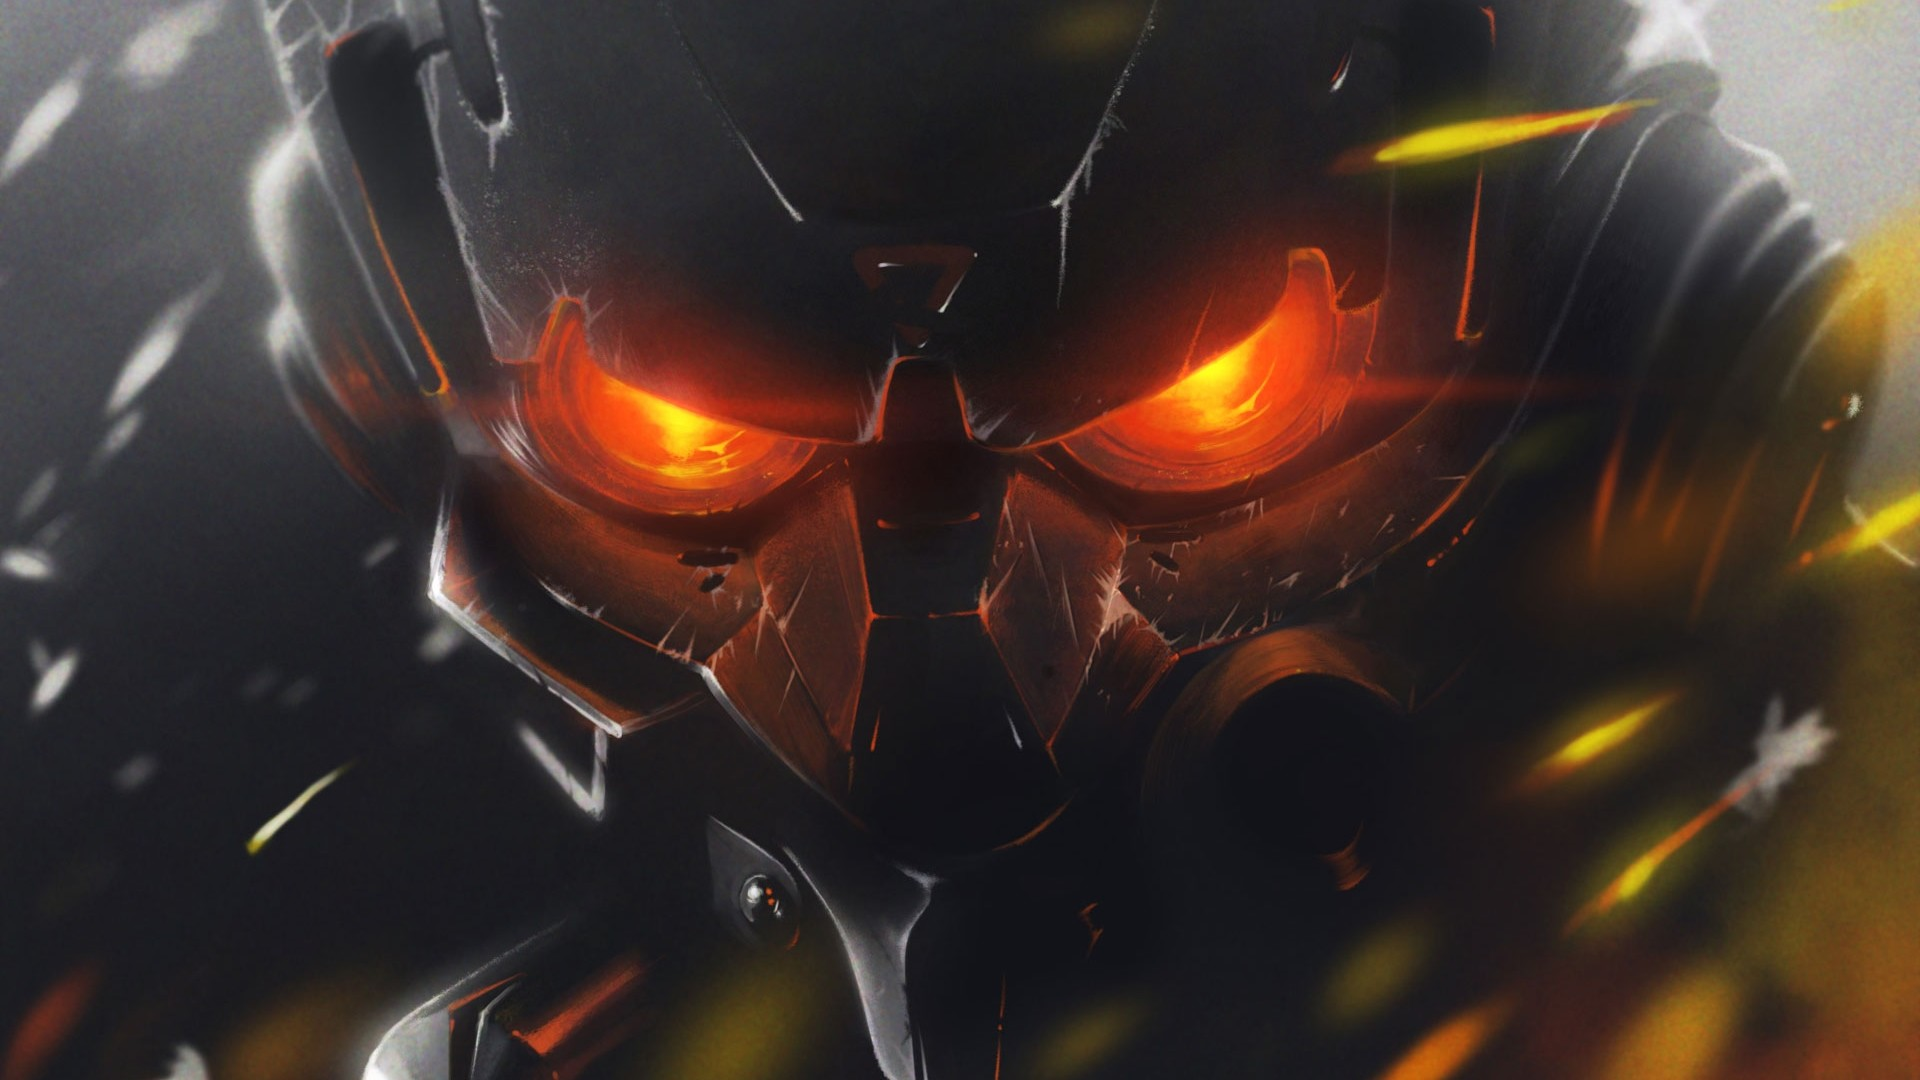 Killzone Shadow Fall Wallpaper 1080p Dubstep Gas Mask Wallpaper 66 Images